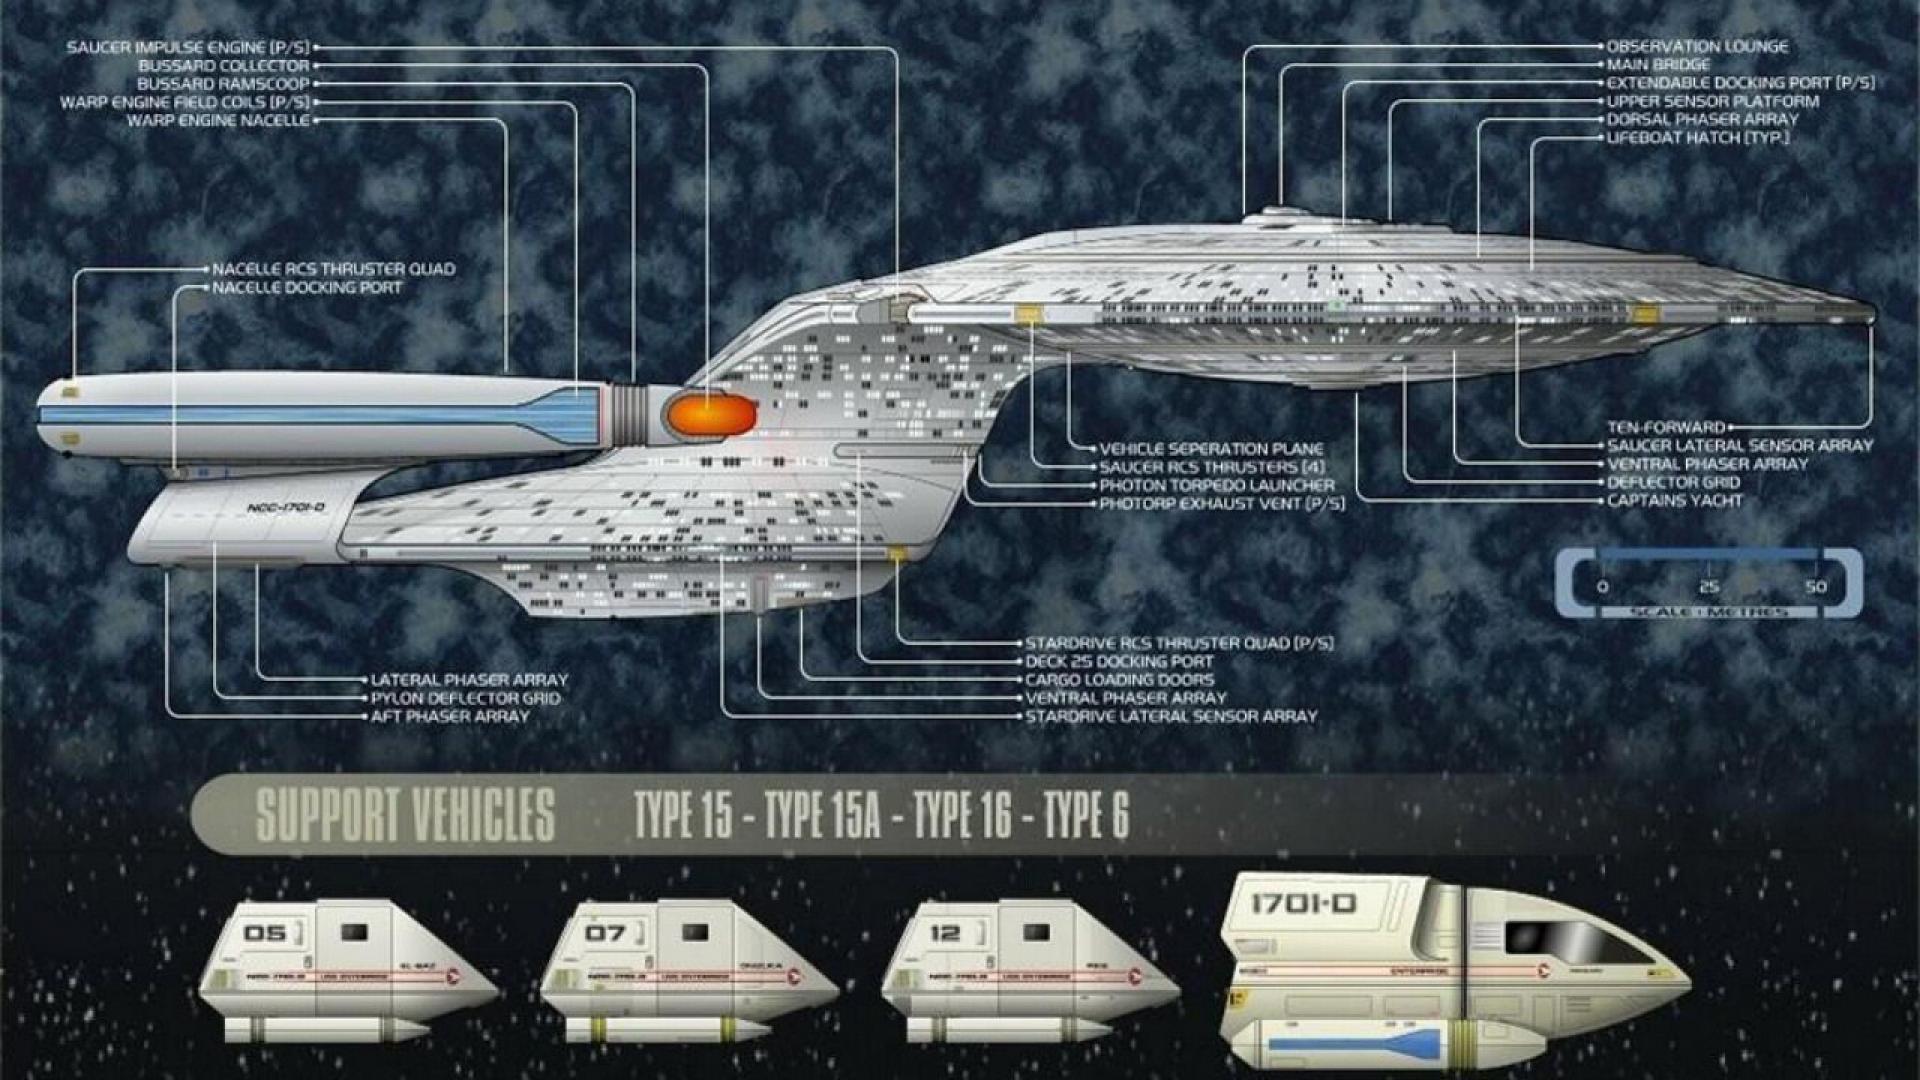 Uss Enterprise Ncc 1701 Wallpaper Star Trek Enterprise Wallpaper